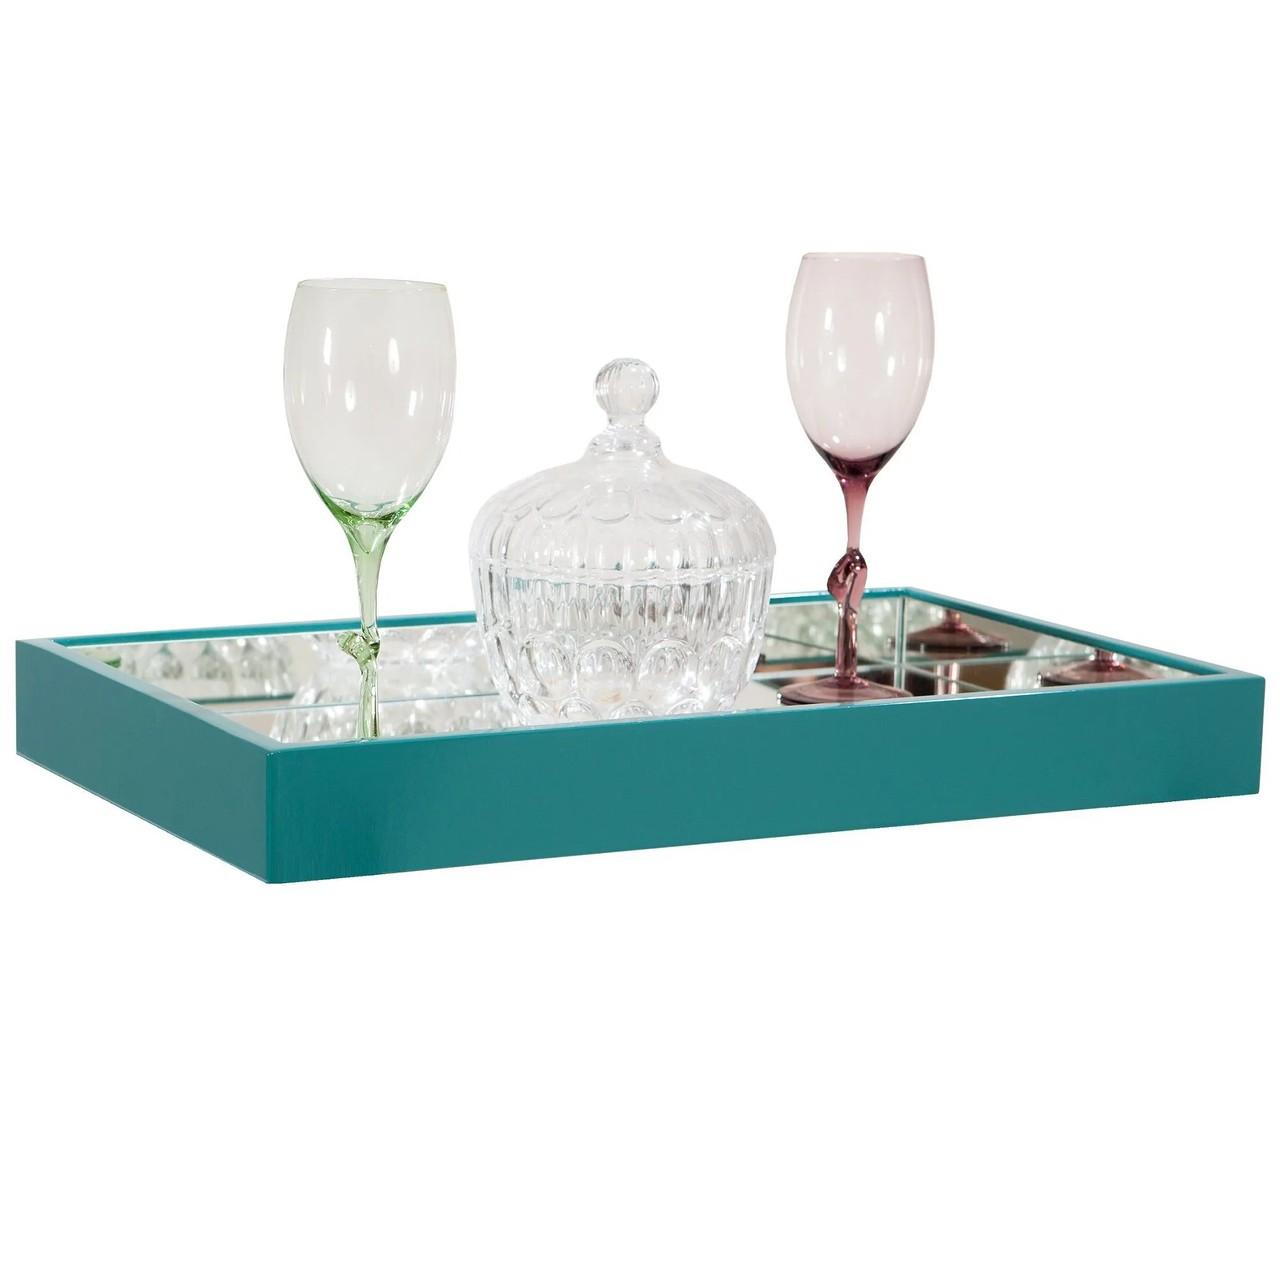 Bandeja espelhada decorativa para servir sala de jantar